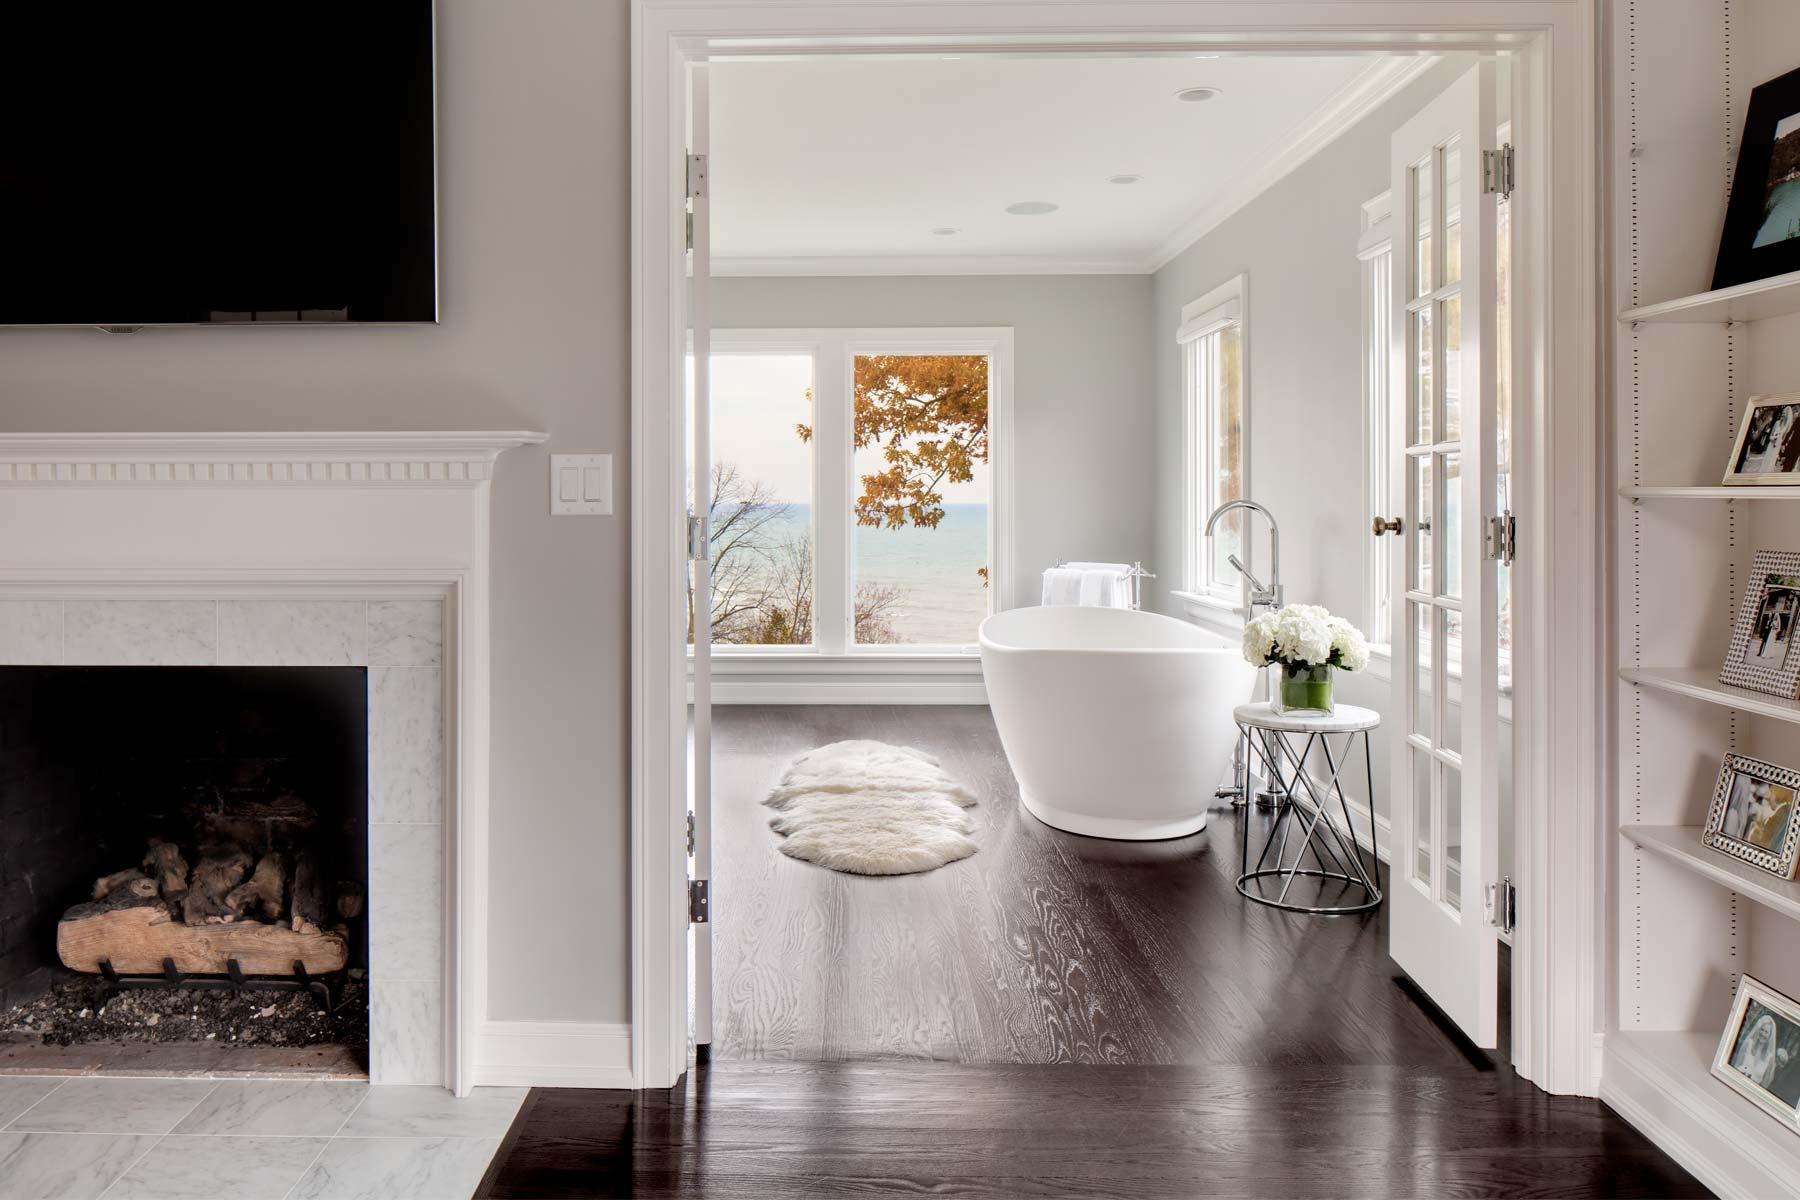 Remodel with Sazama - Bathroom Remodel